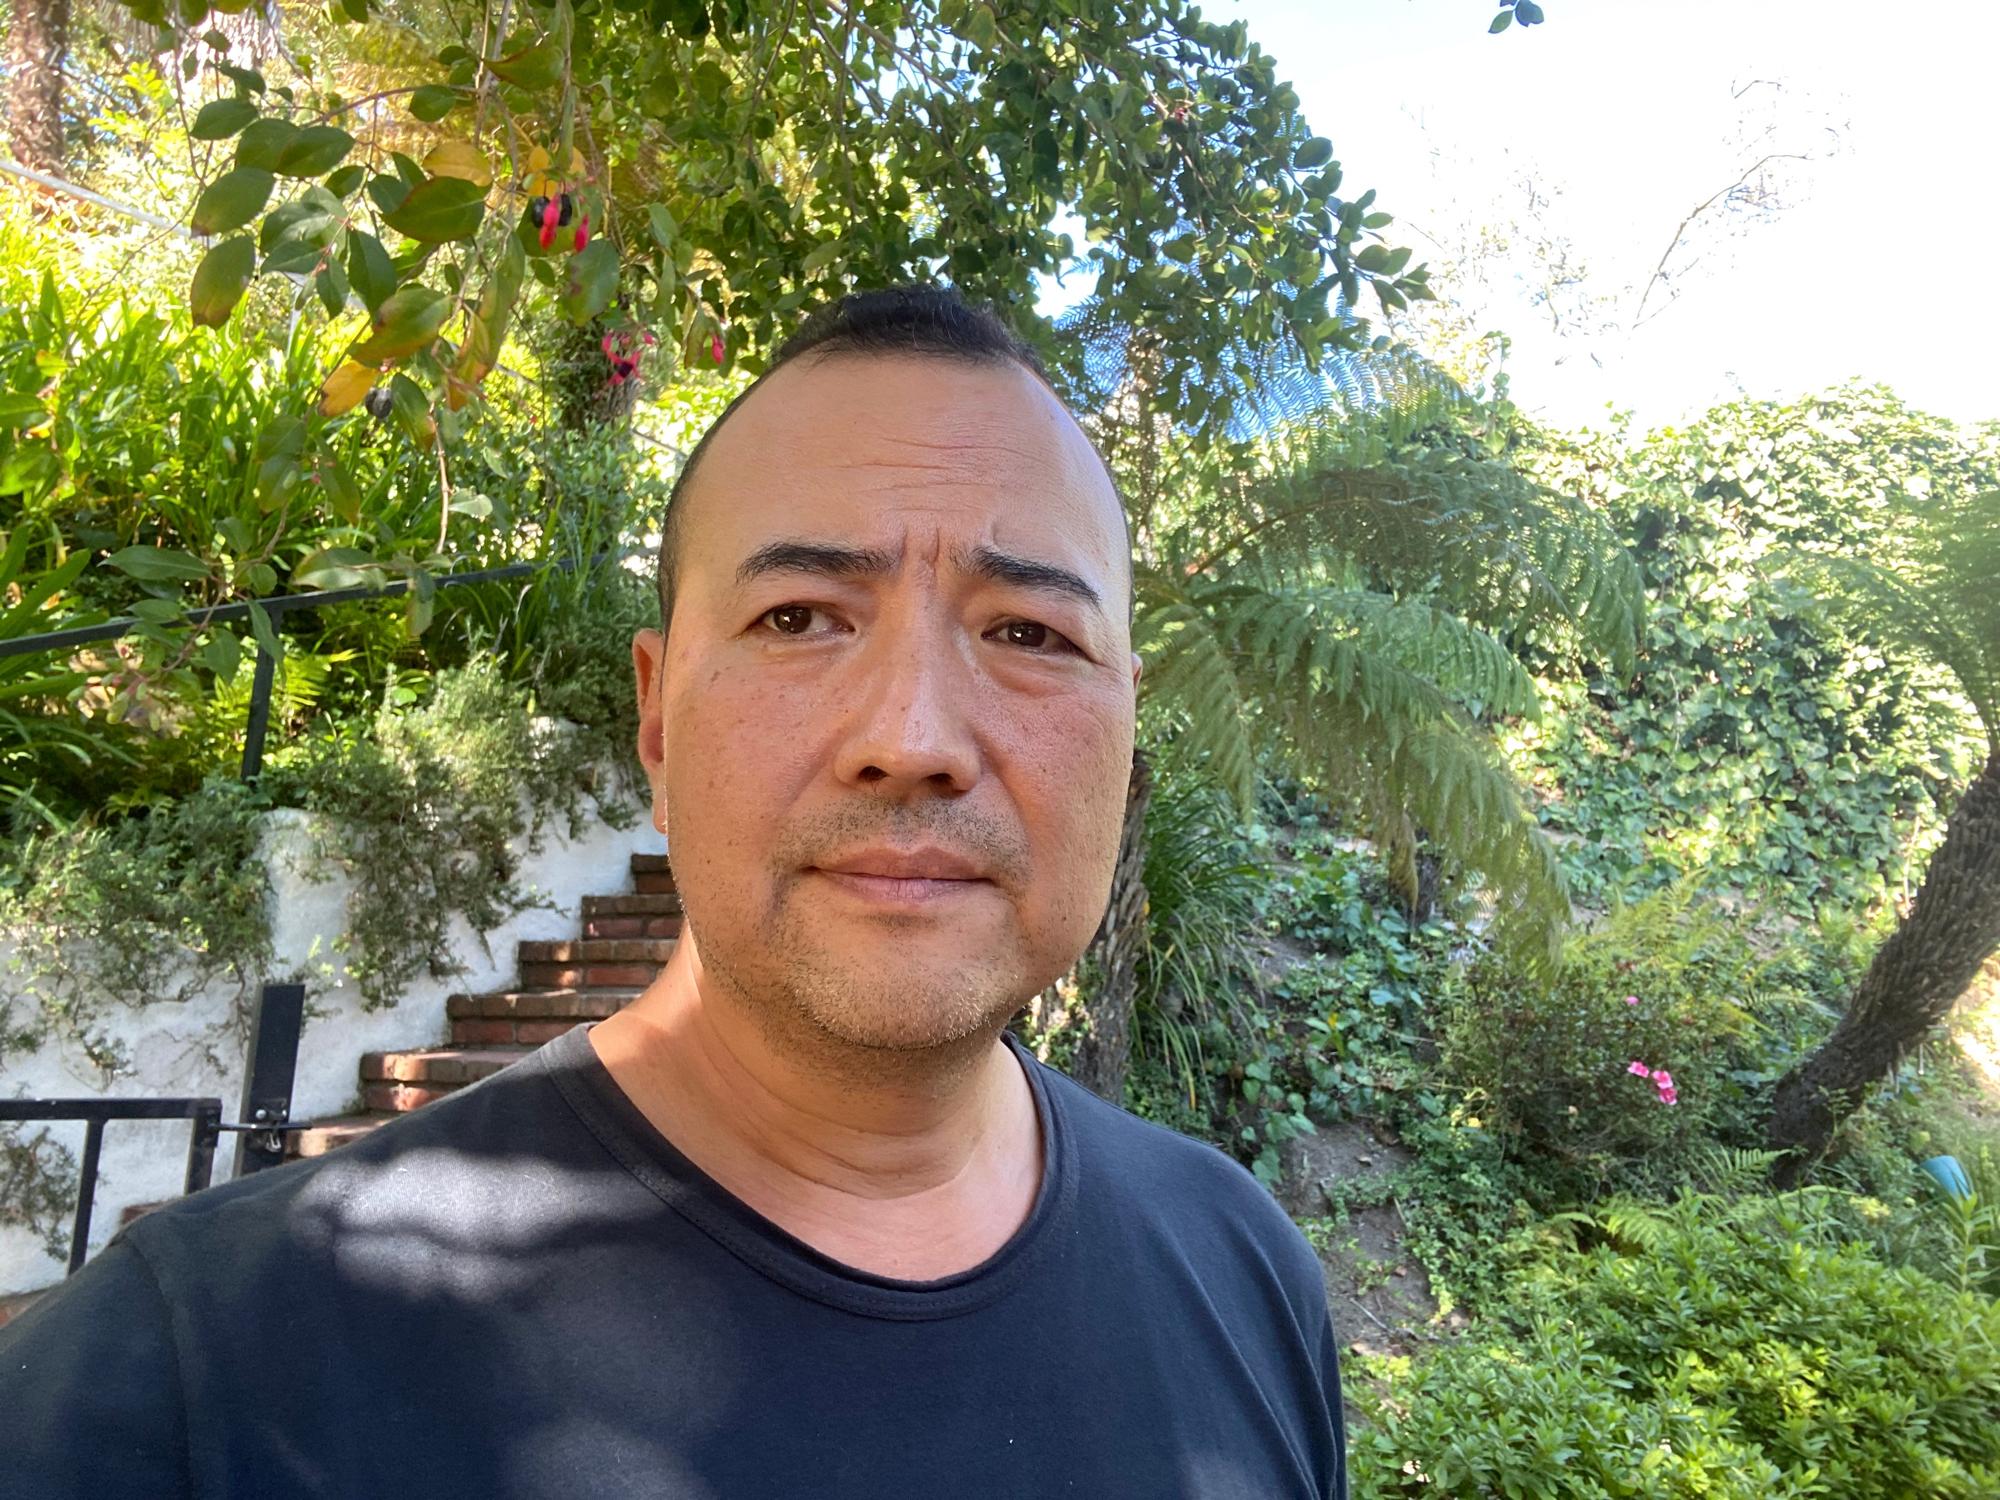 David Ruy headshot